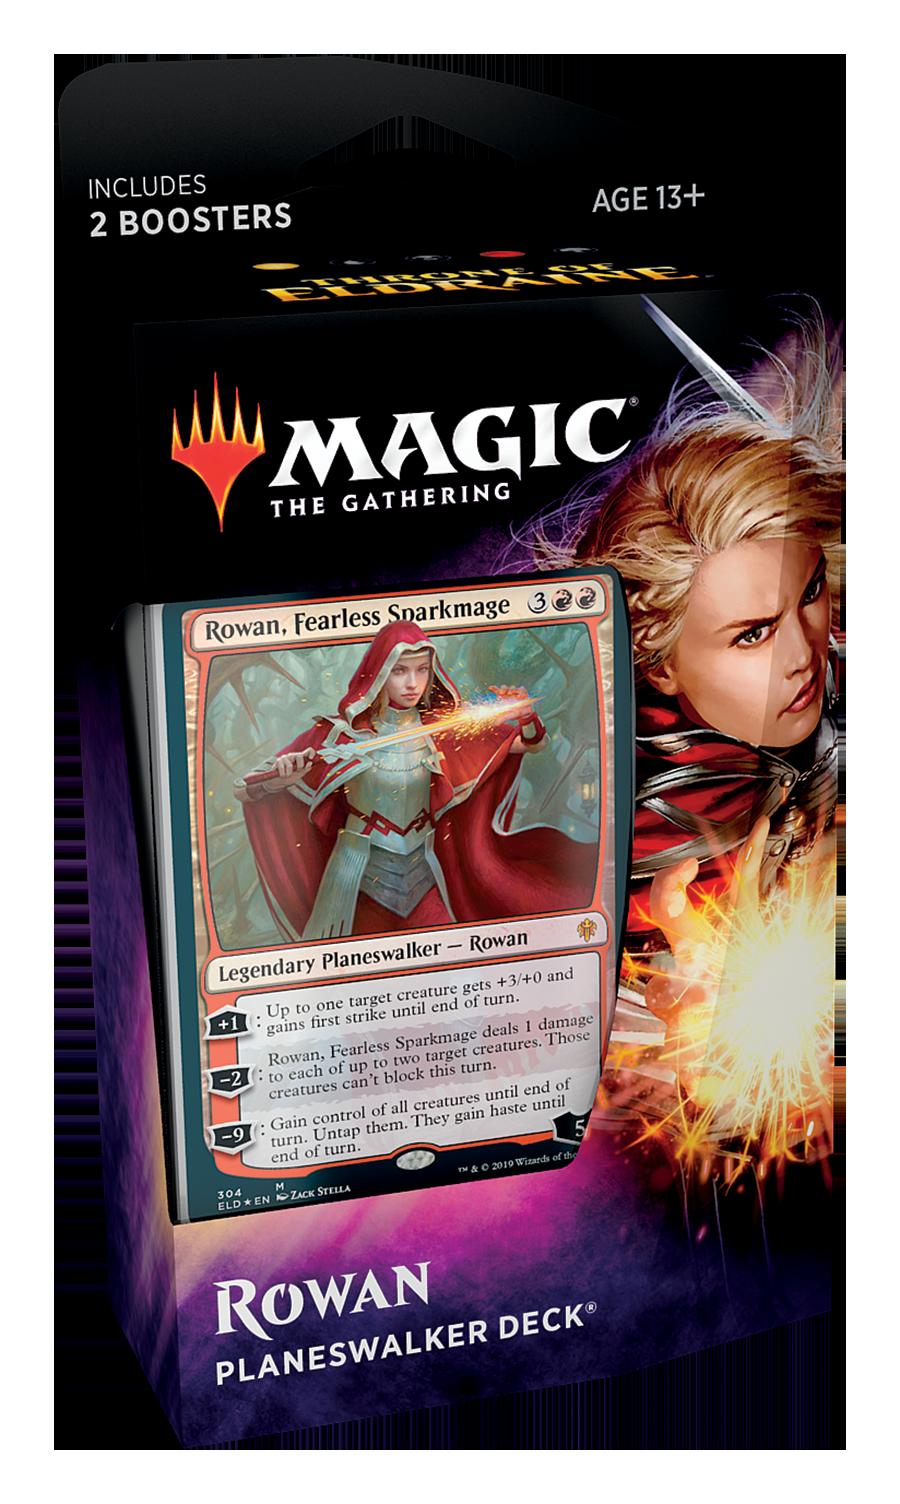 Magic The Gathering: Throne of Eldraine Planeswalker Decks- Rowan image